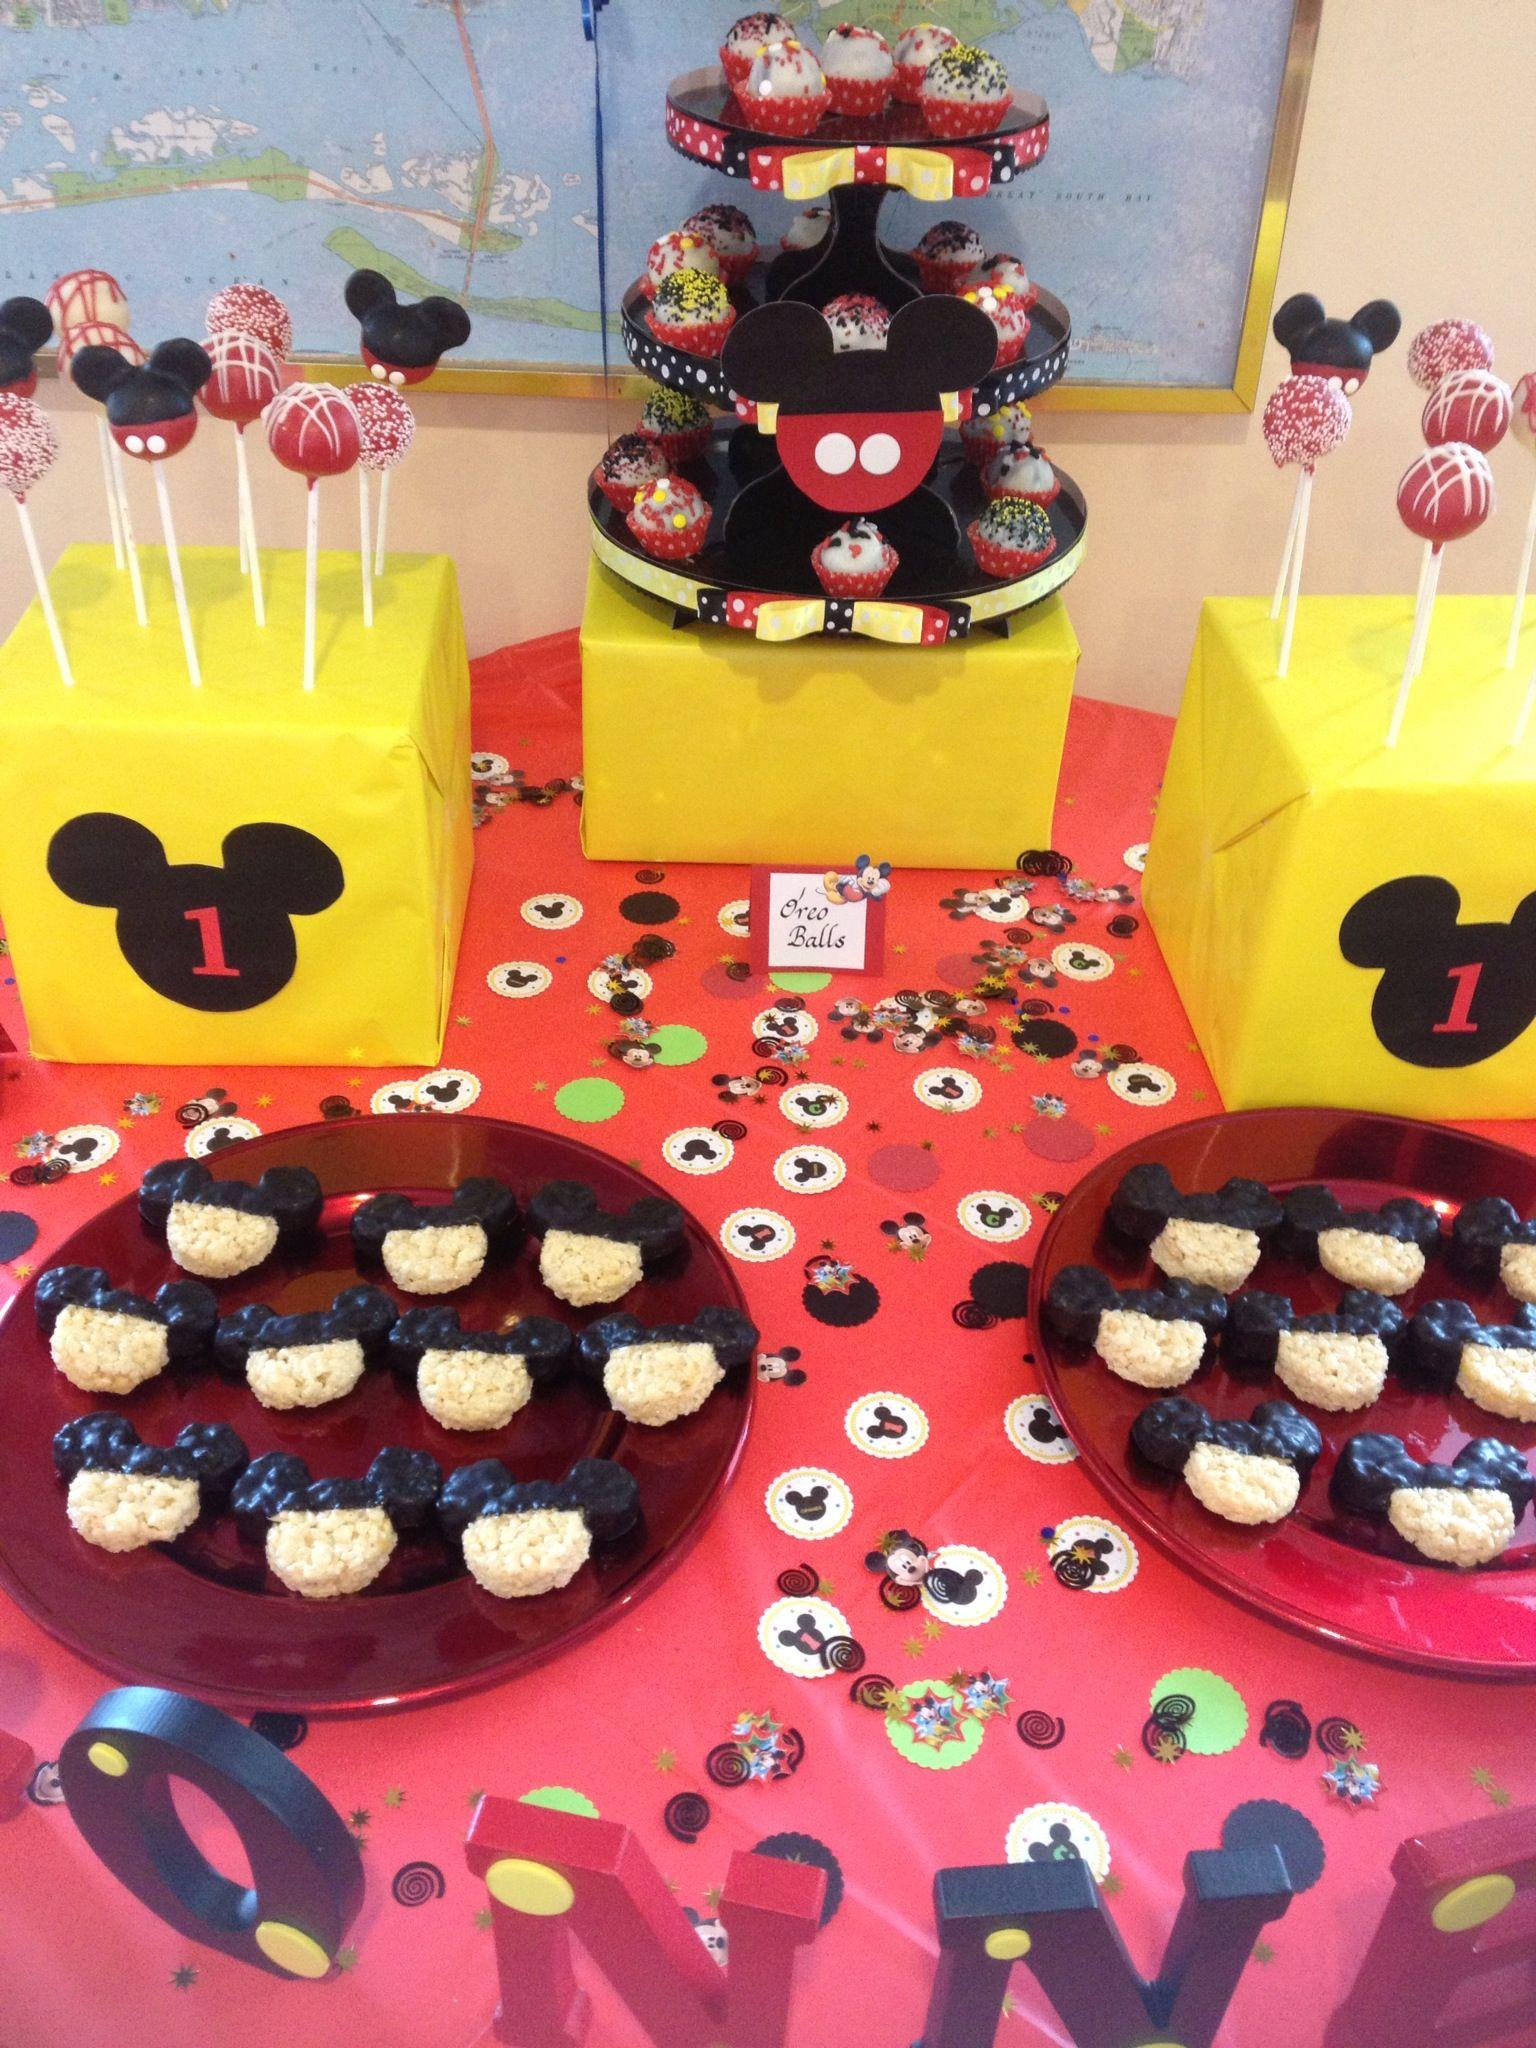 Mickey Mouse 1st Birthday Dessert Table Thelastbiteny Dessert Table Birthday Mickey Mouse 1st Birthday Dessert Table